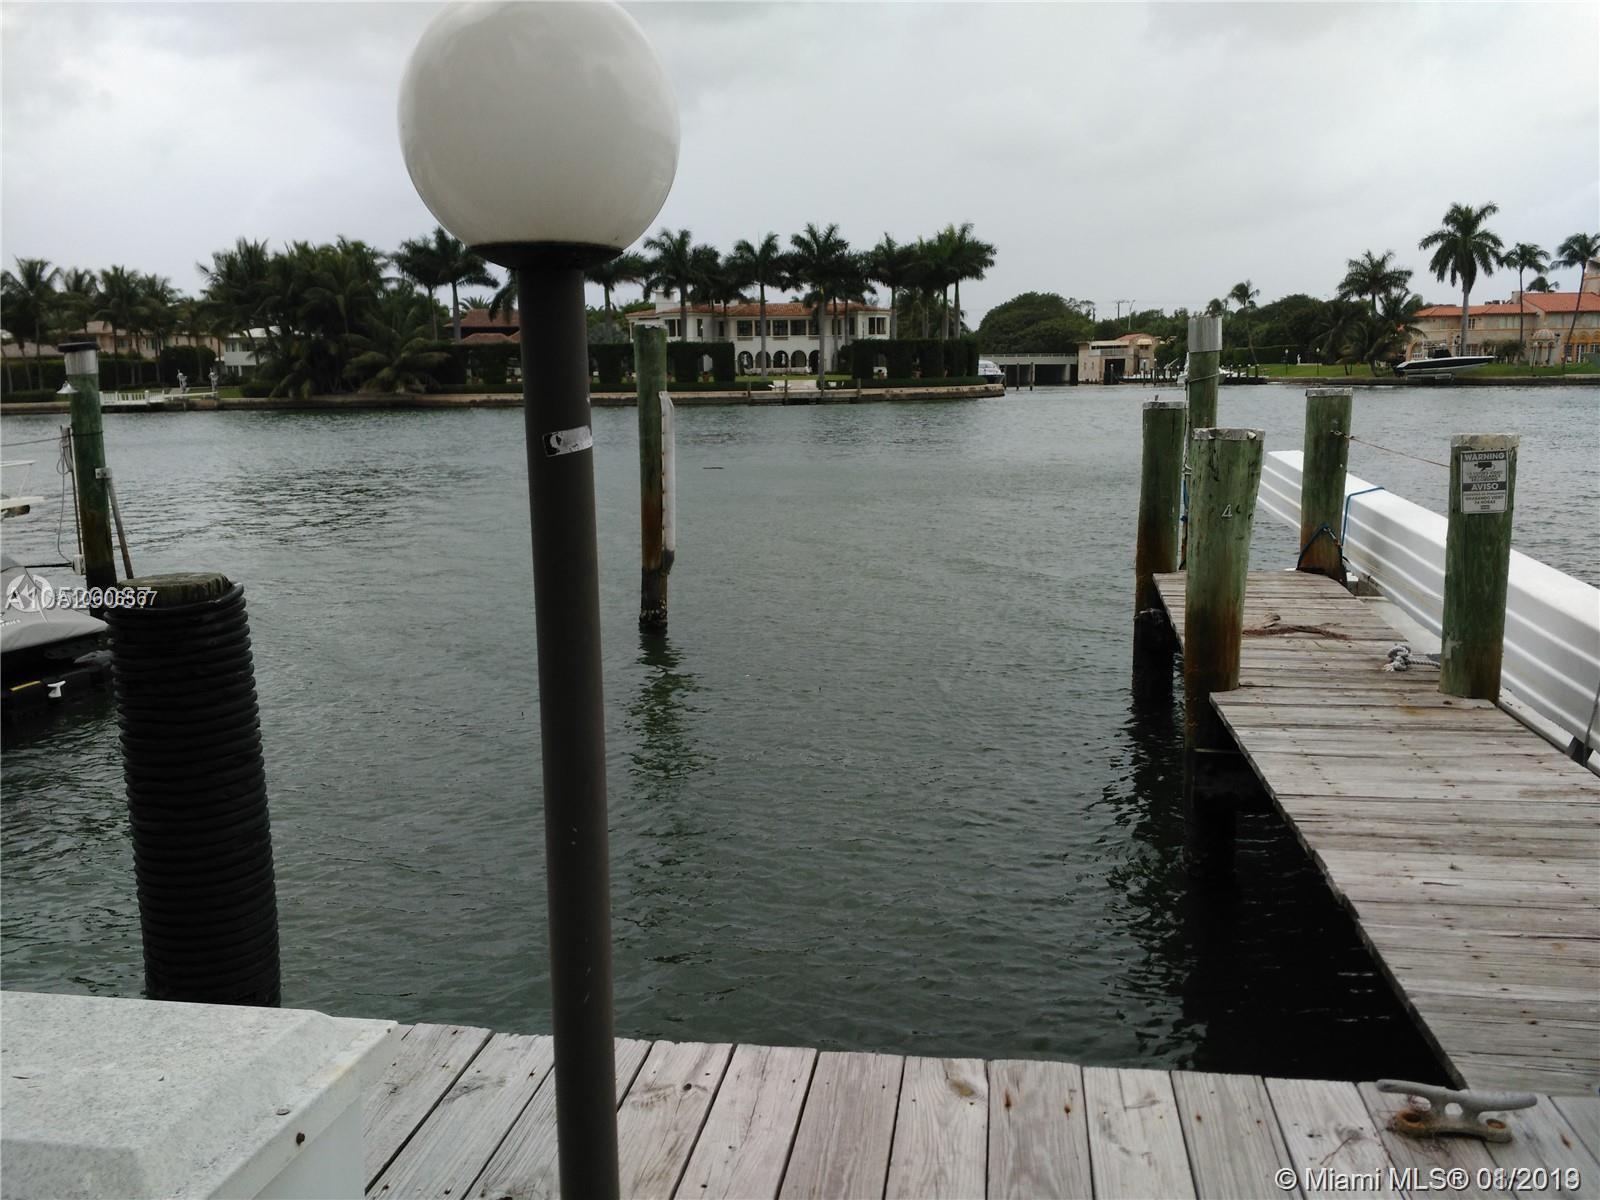 Carriage Club North Tower - 5005 Collins Ave, Miami Beach, FL 33140